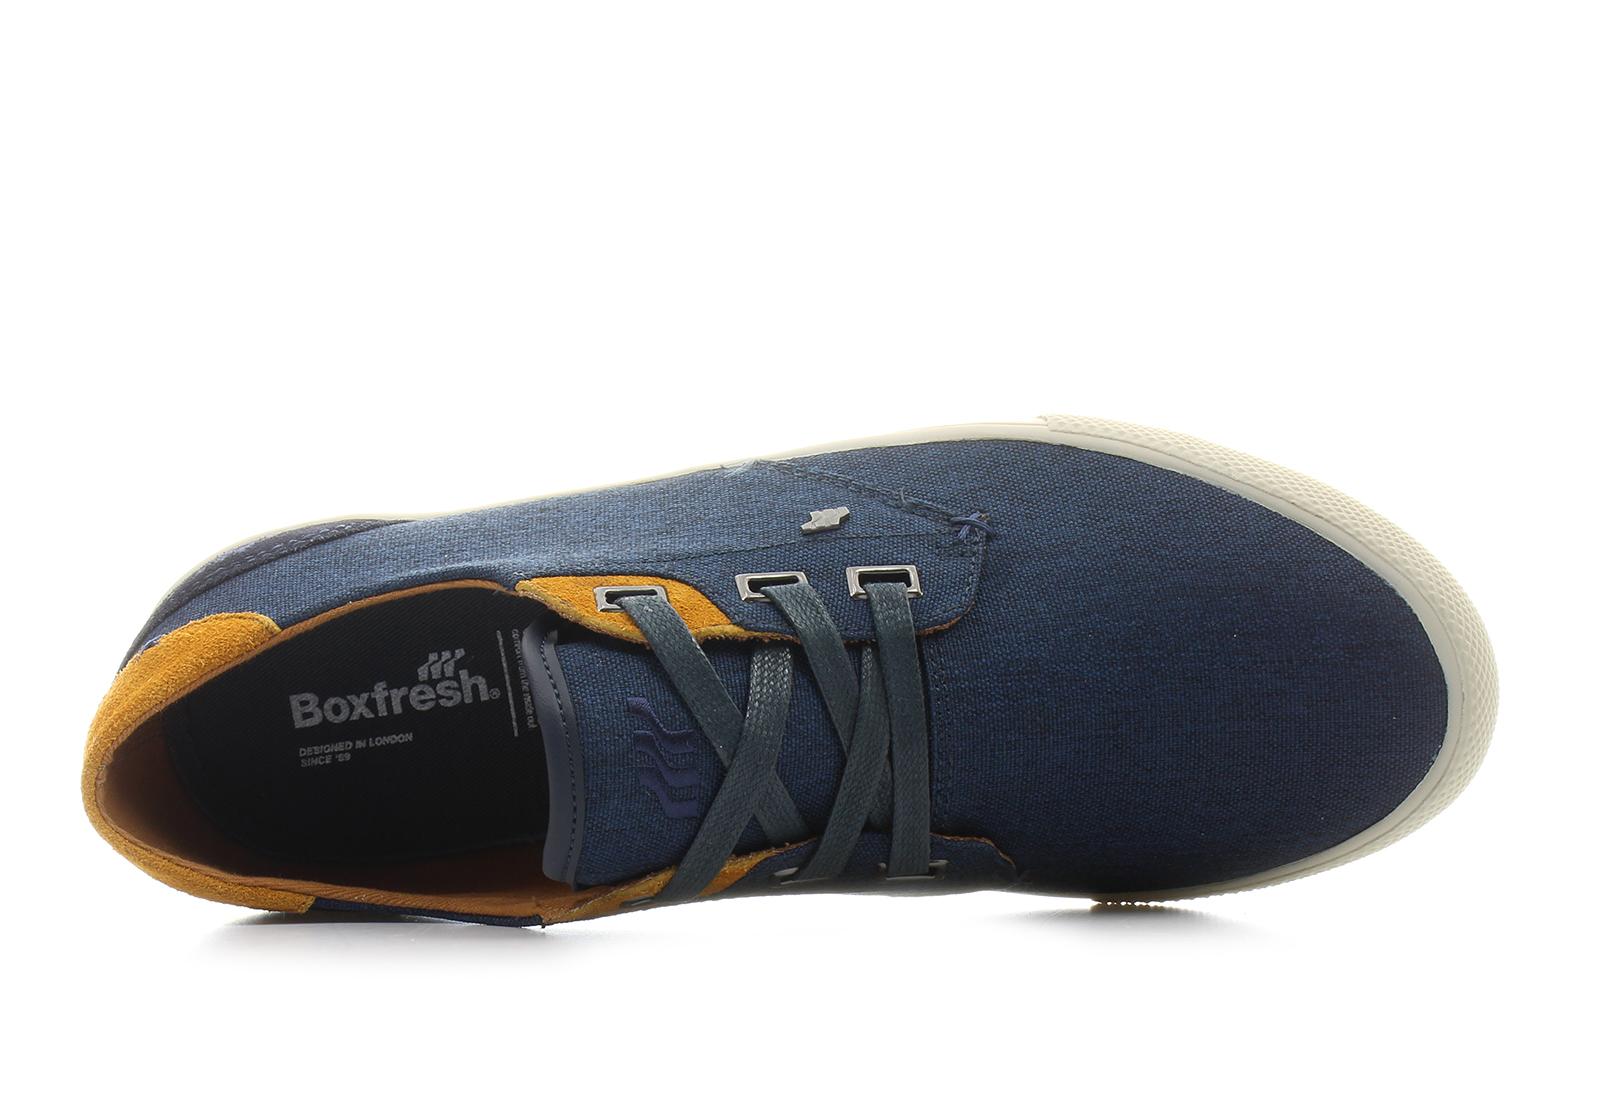 Boxfresh Shoes - Stern - E14952-nvy